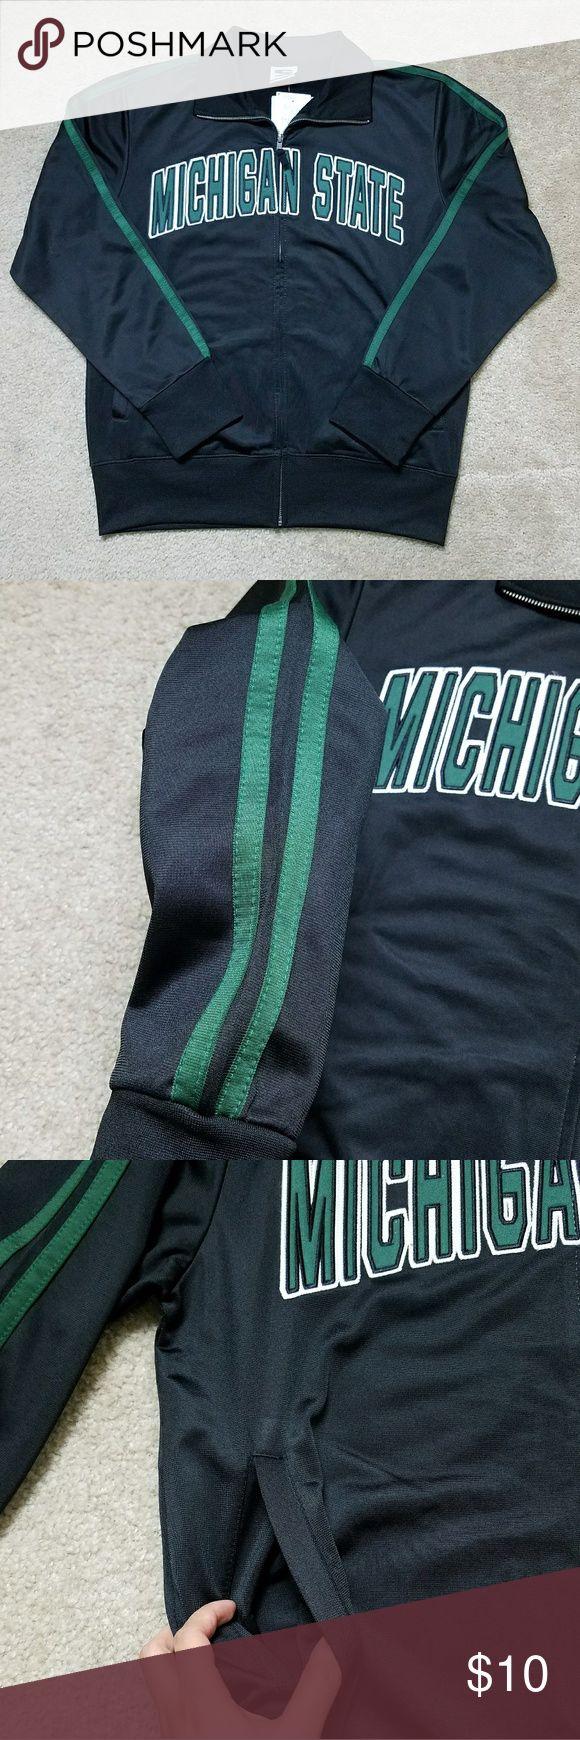 Stadium Athletics Michigan State Jacket NWT. Michigan State. Mens size medium. From a smoke and pet free home. Stadium Athletics Jackets & Coats